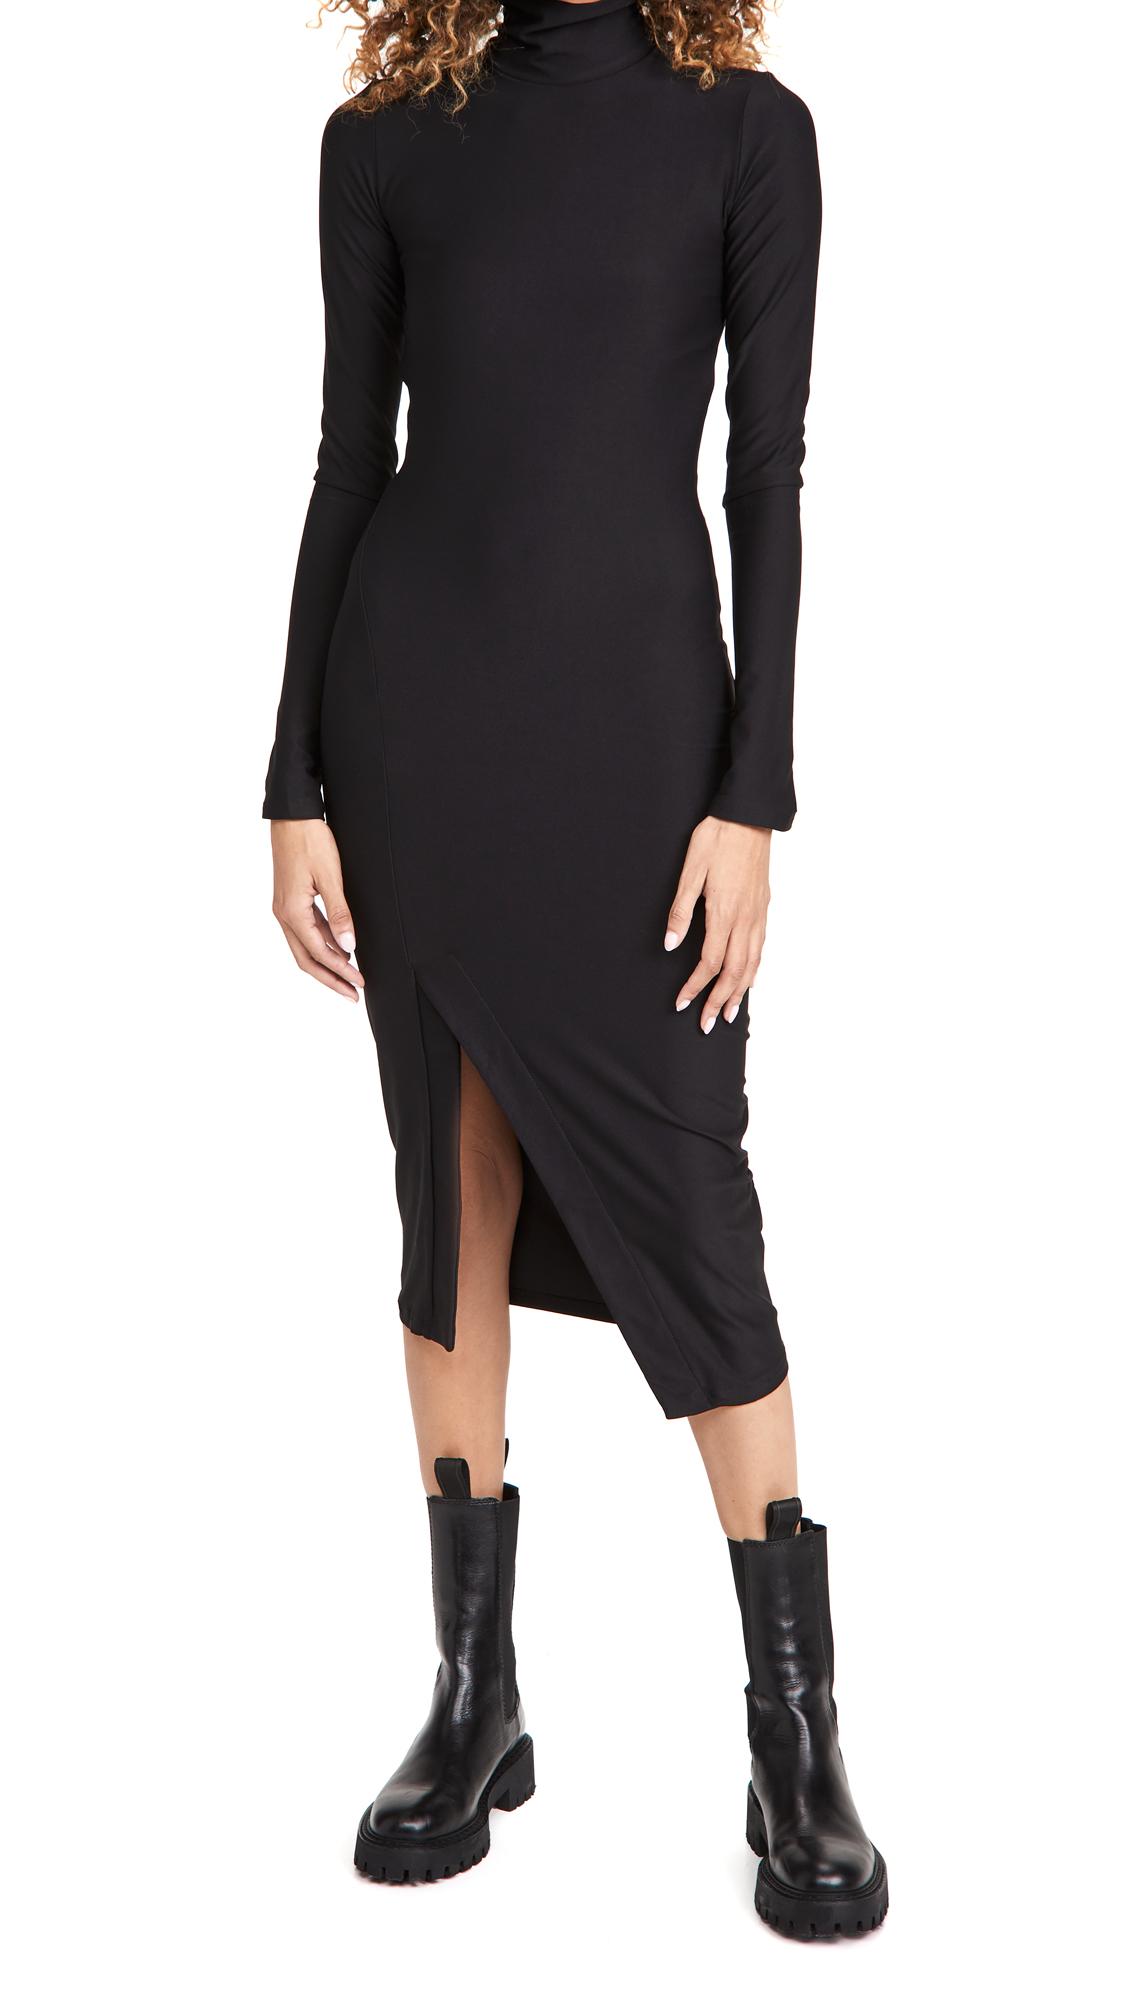 Alix Ardsley Dress